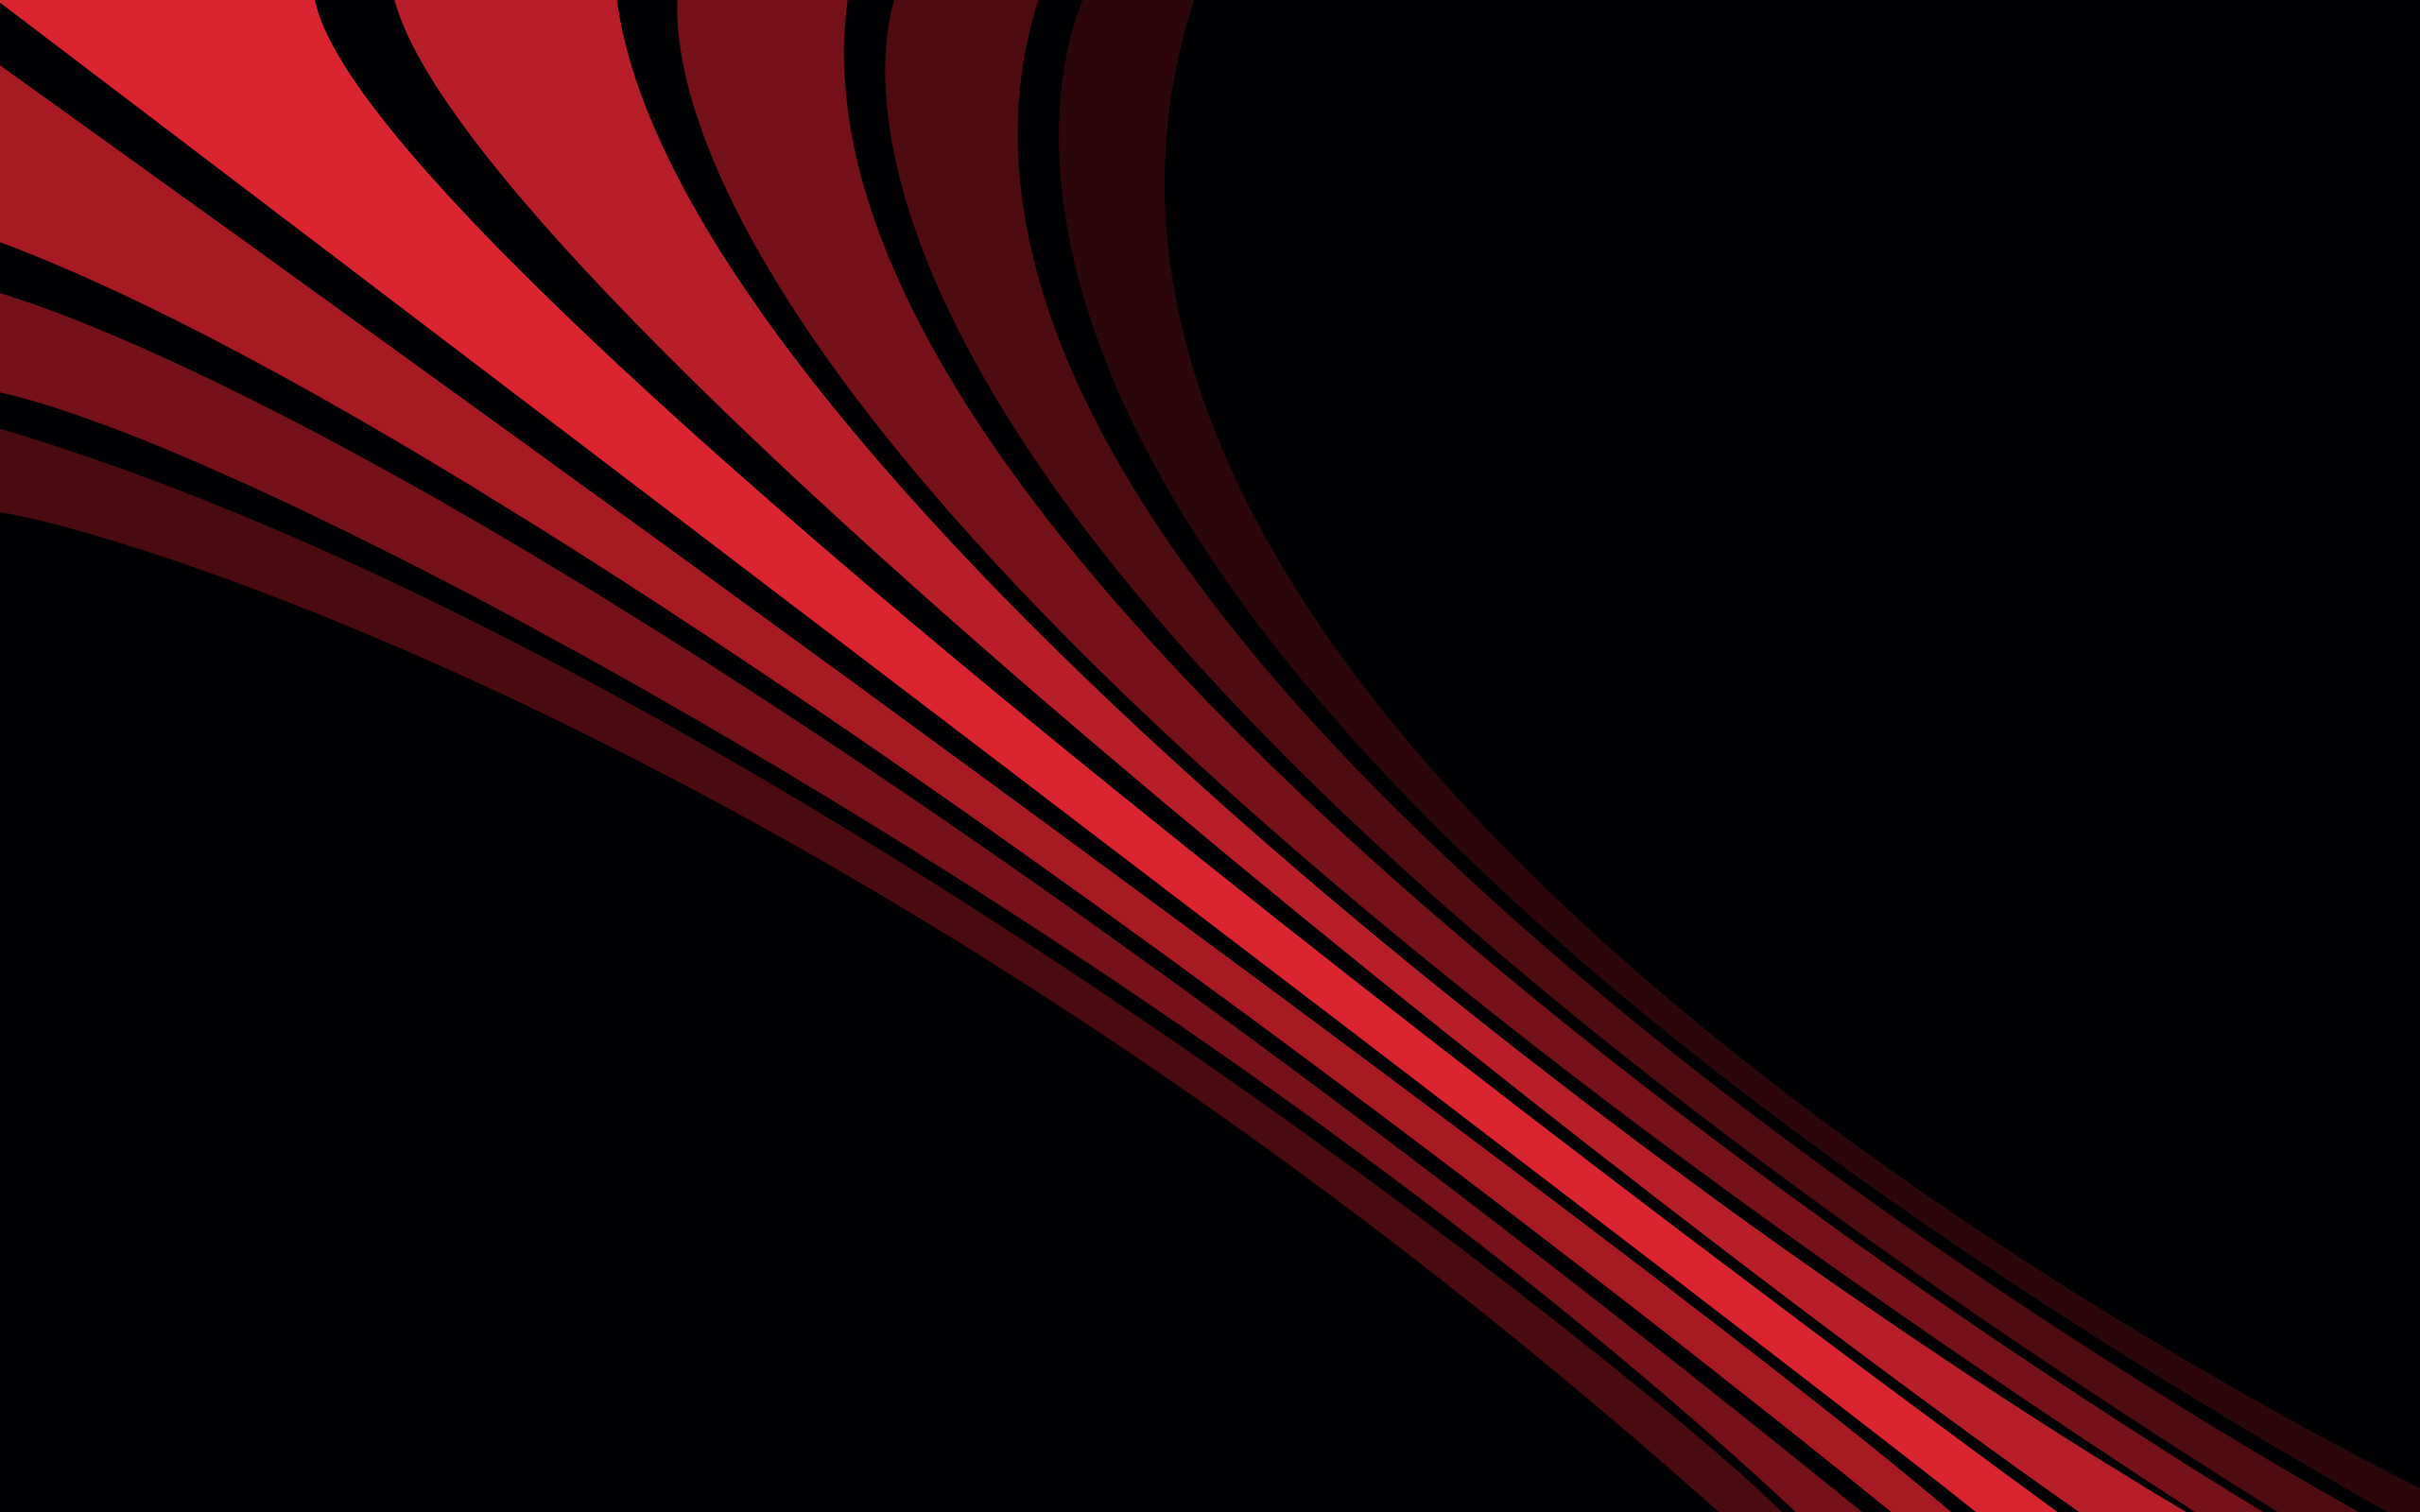 … red and black wallpaper images 4 cool wallpaper hdblackwallpaper com …